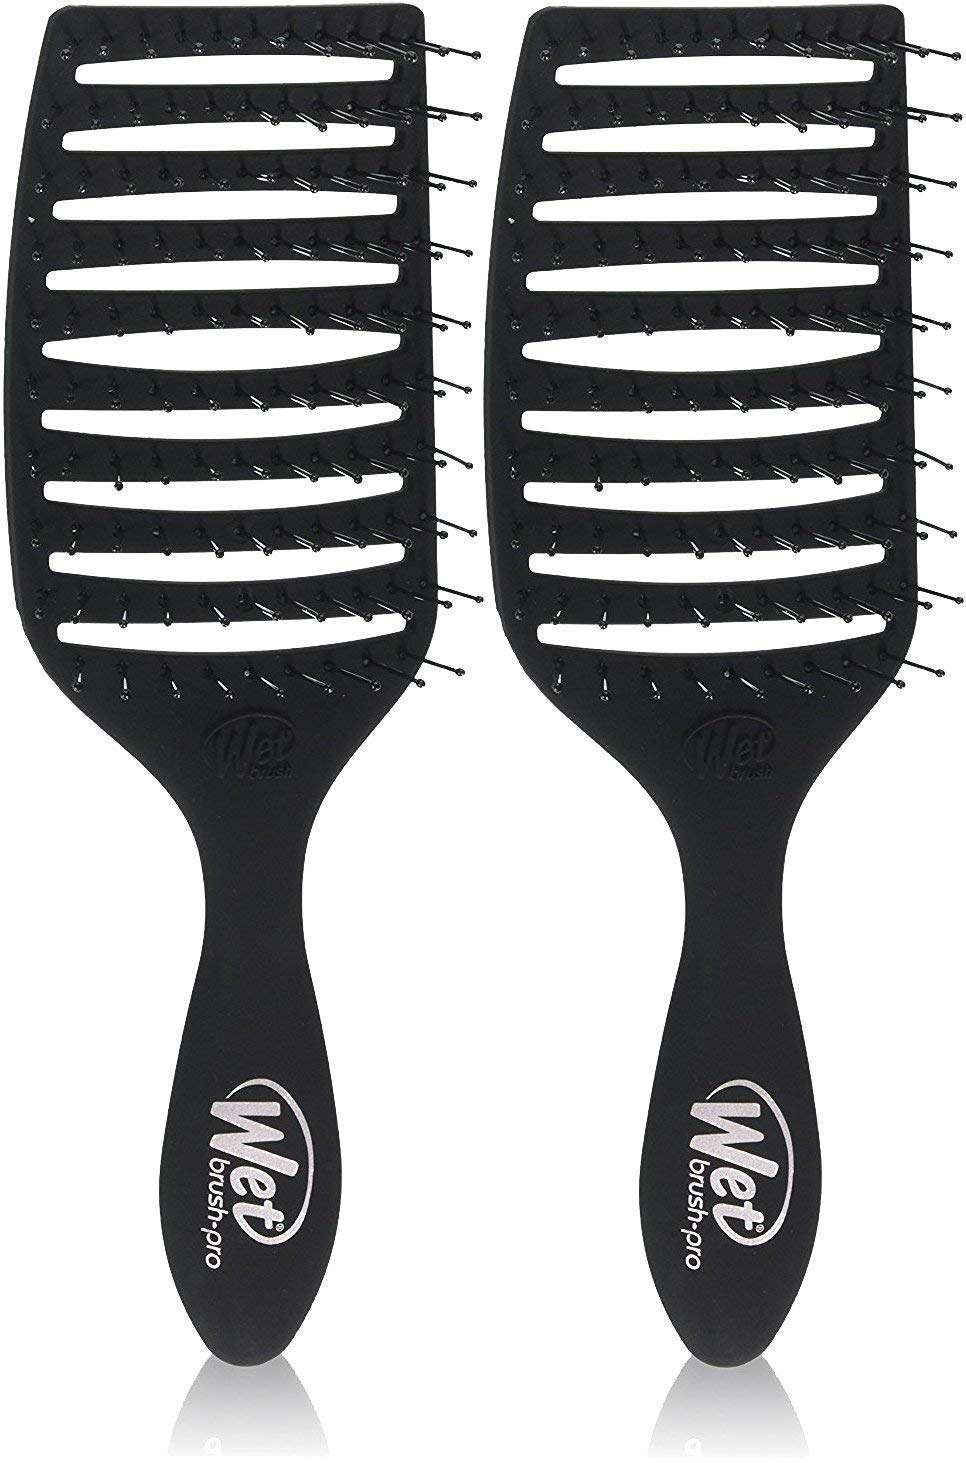 2 PACK - Women's Wet Brush Pro Epic Professional Quick Dry Hair Brush (Black)